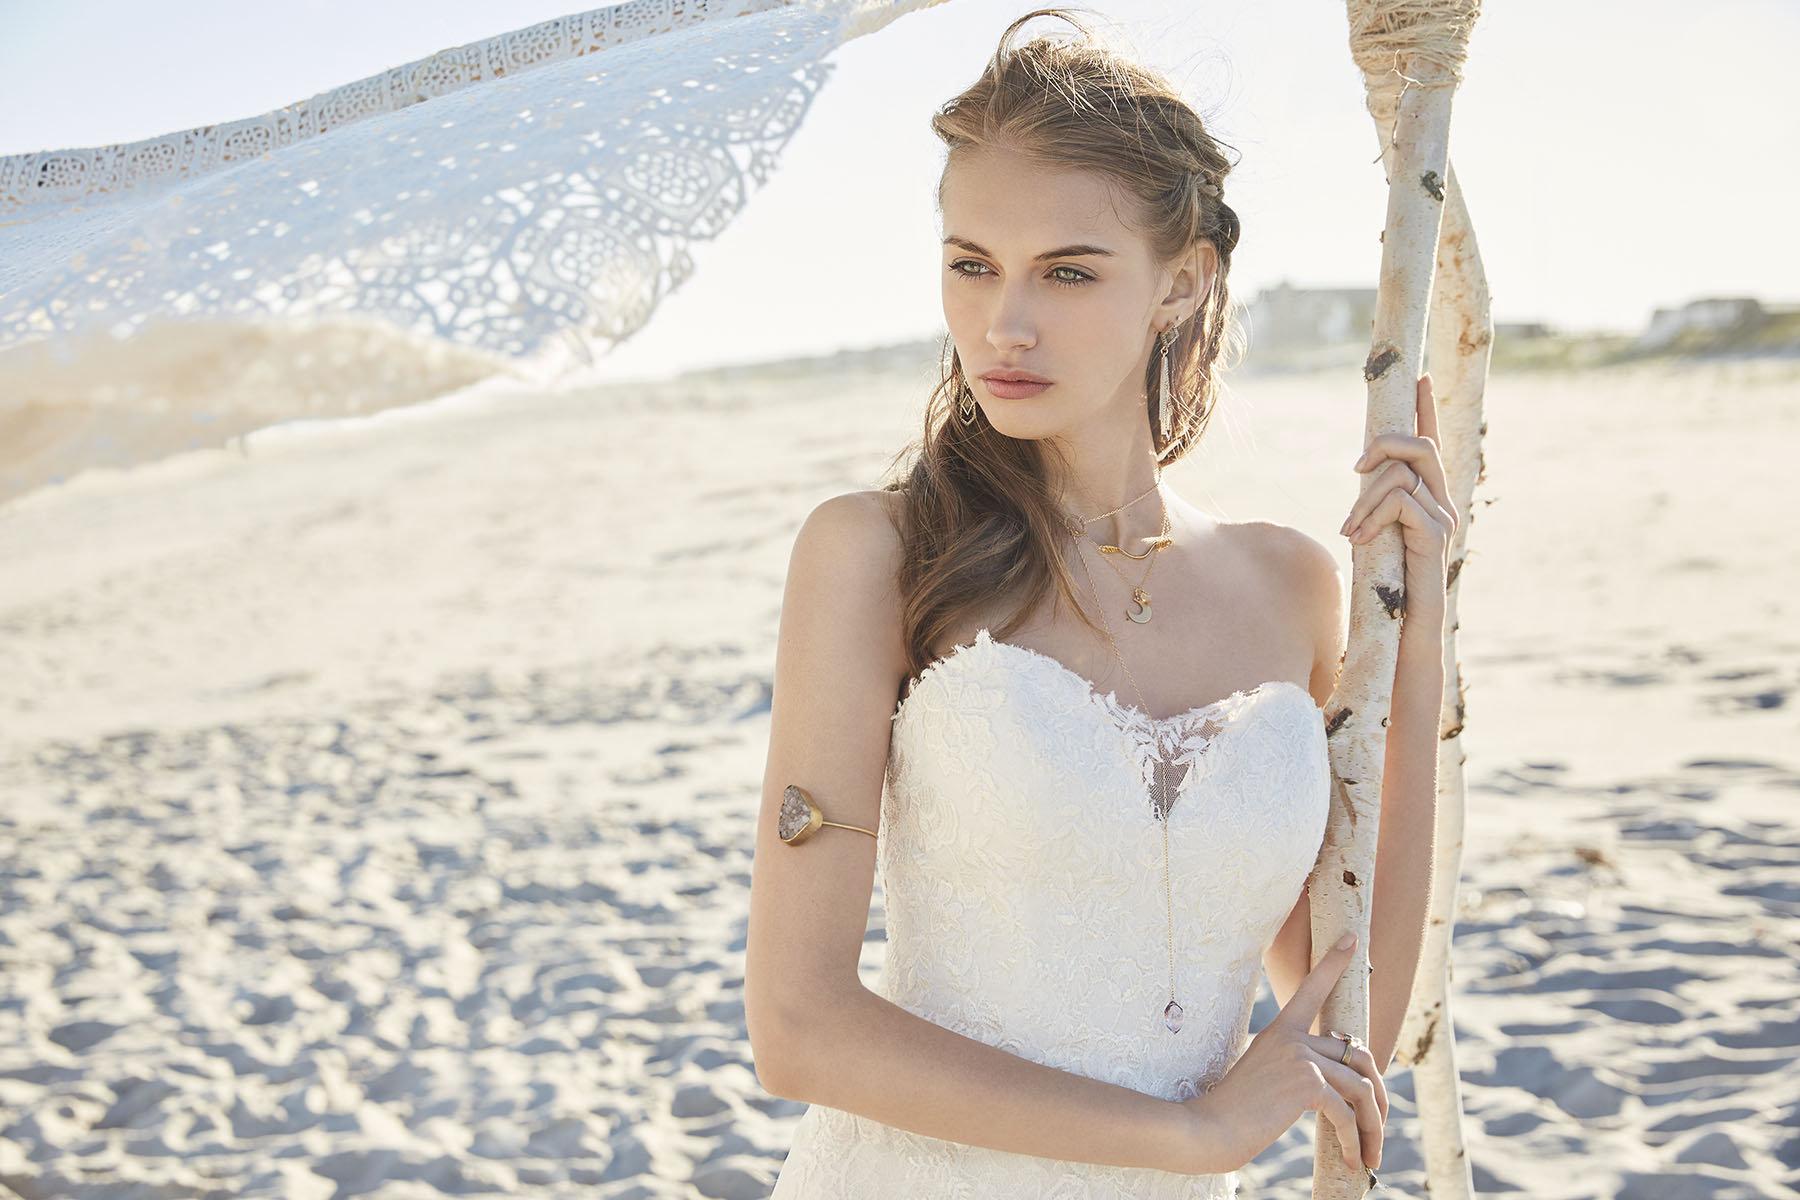 spanish sweetheart wedding dress